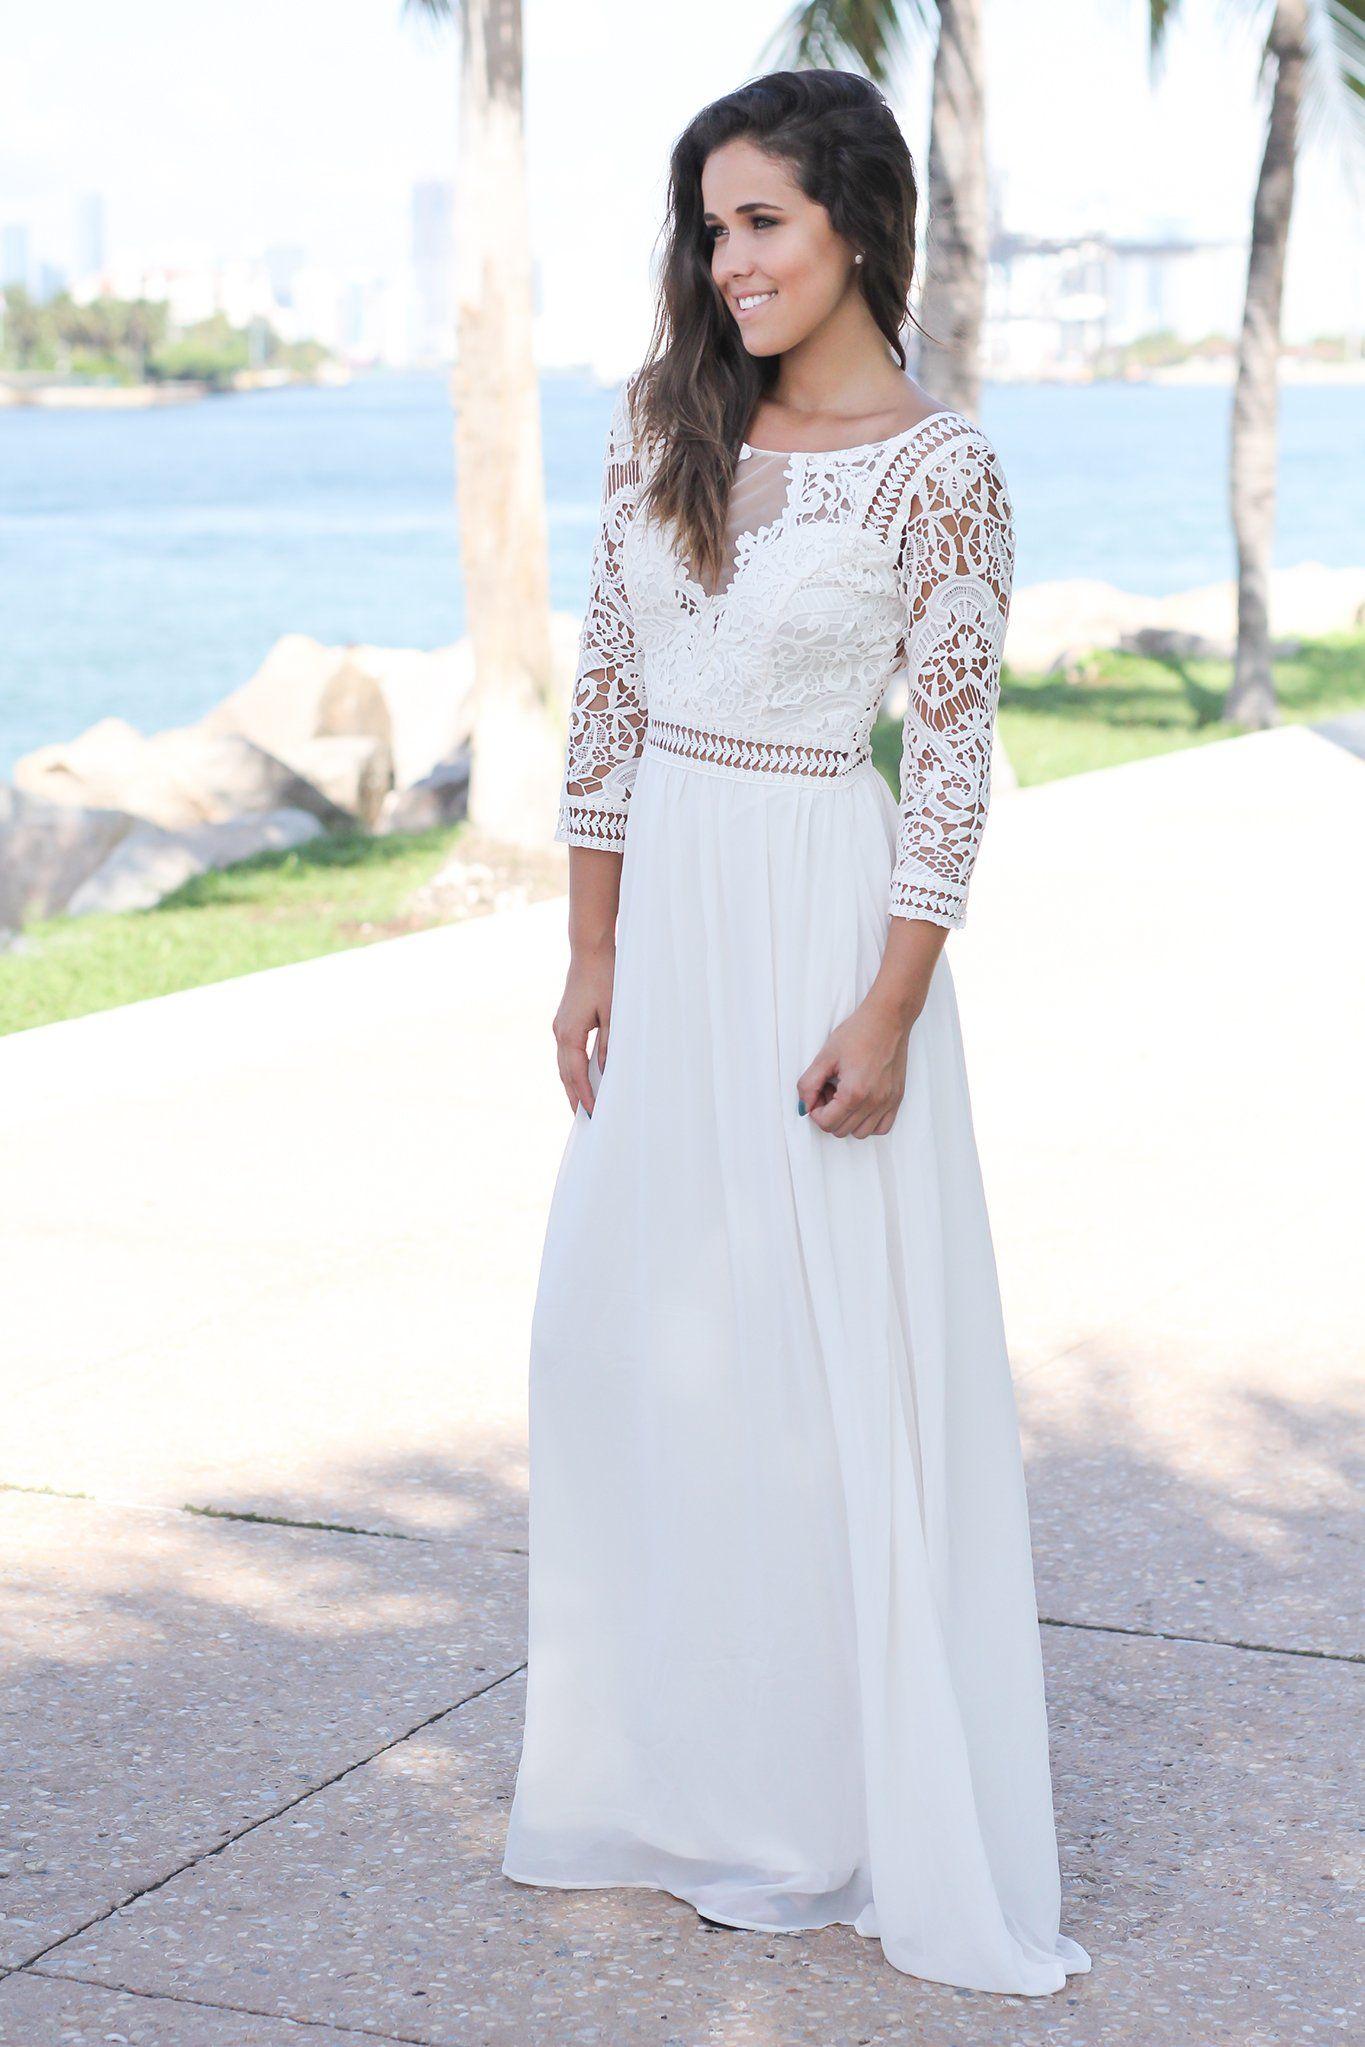 Ivory Crochet Maxi Dress With 3 4 Sleeves Maxi Dress Maxi Dress Party Crochet Maxi Dress [ 2047 x 1365 Pixel ]